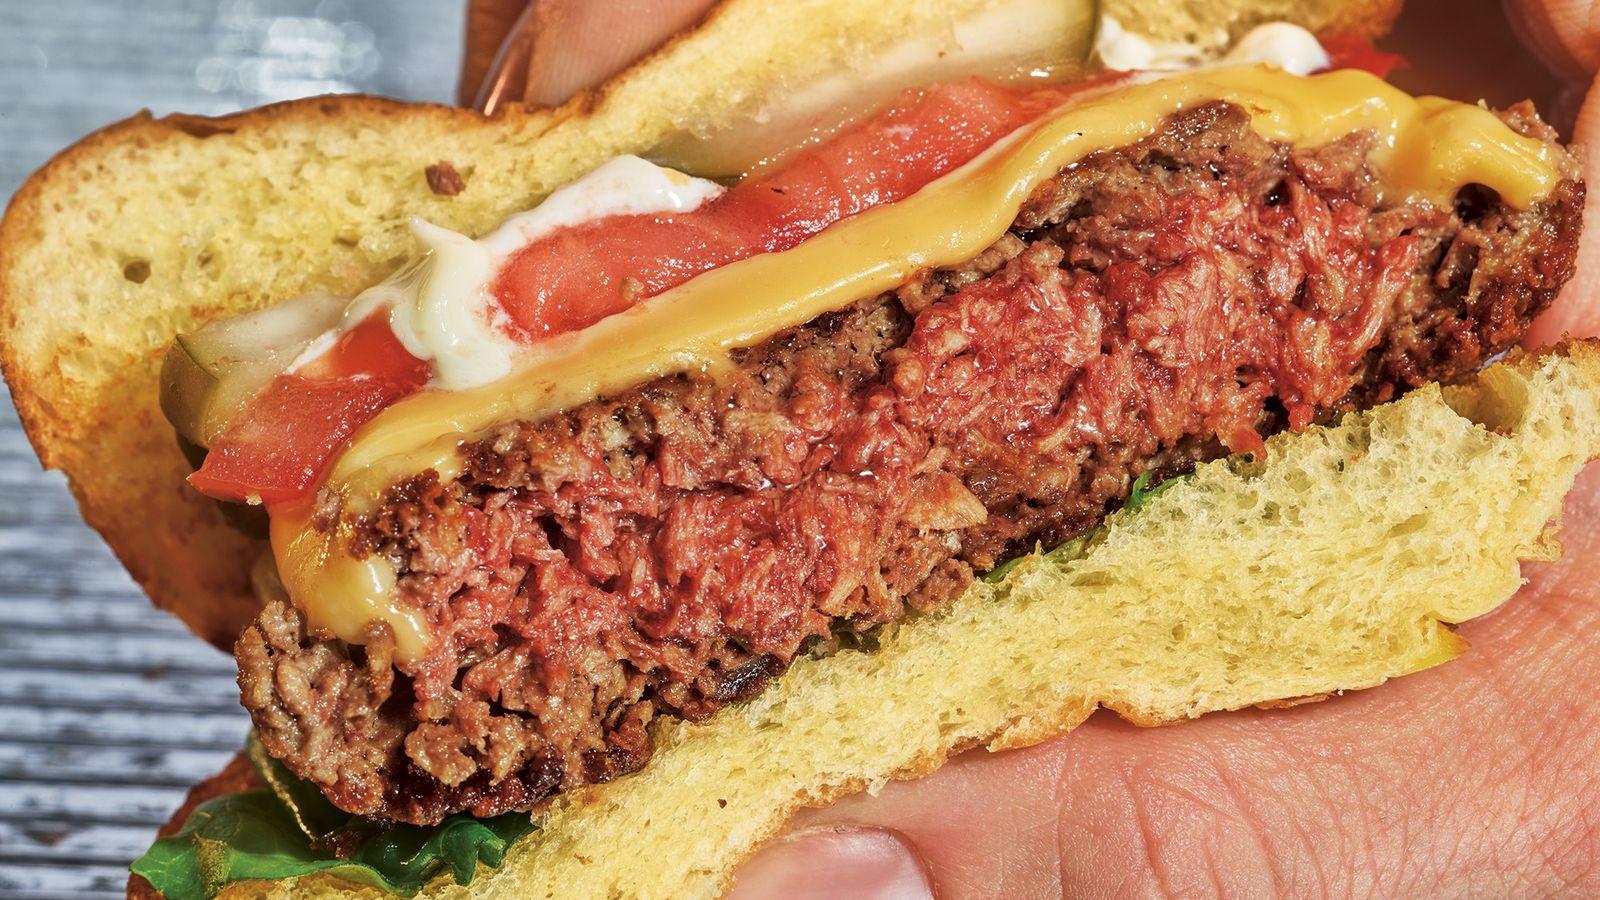 futuro da comida hamburguer